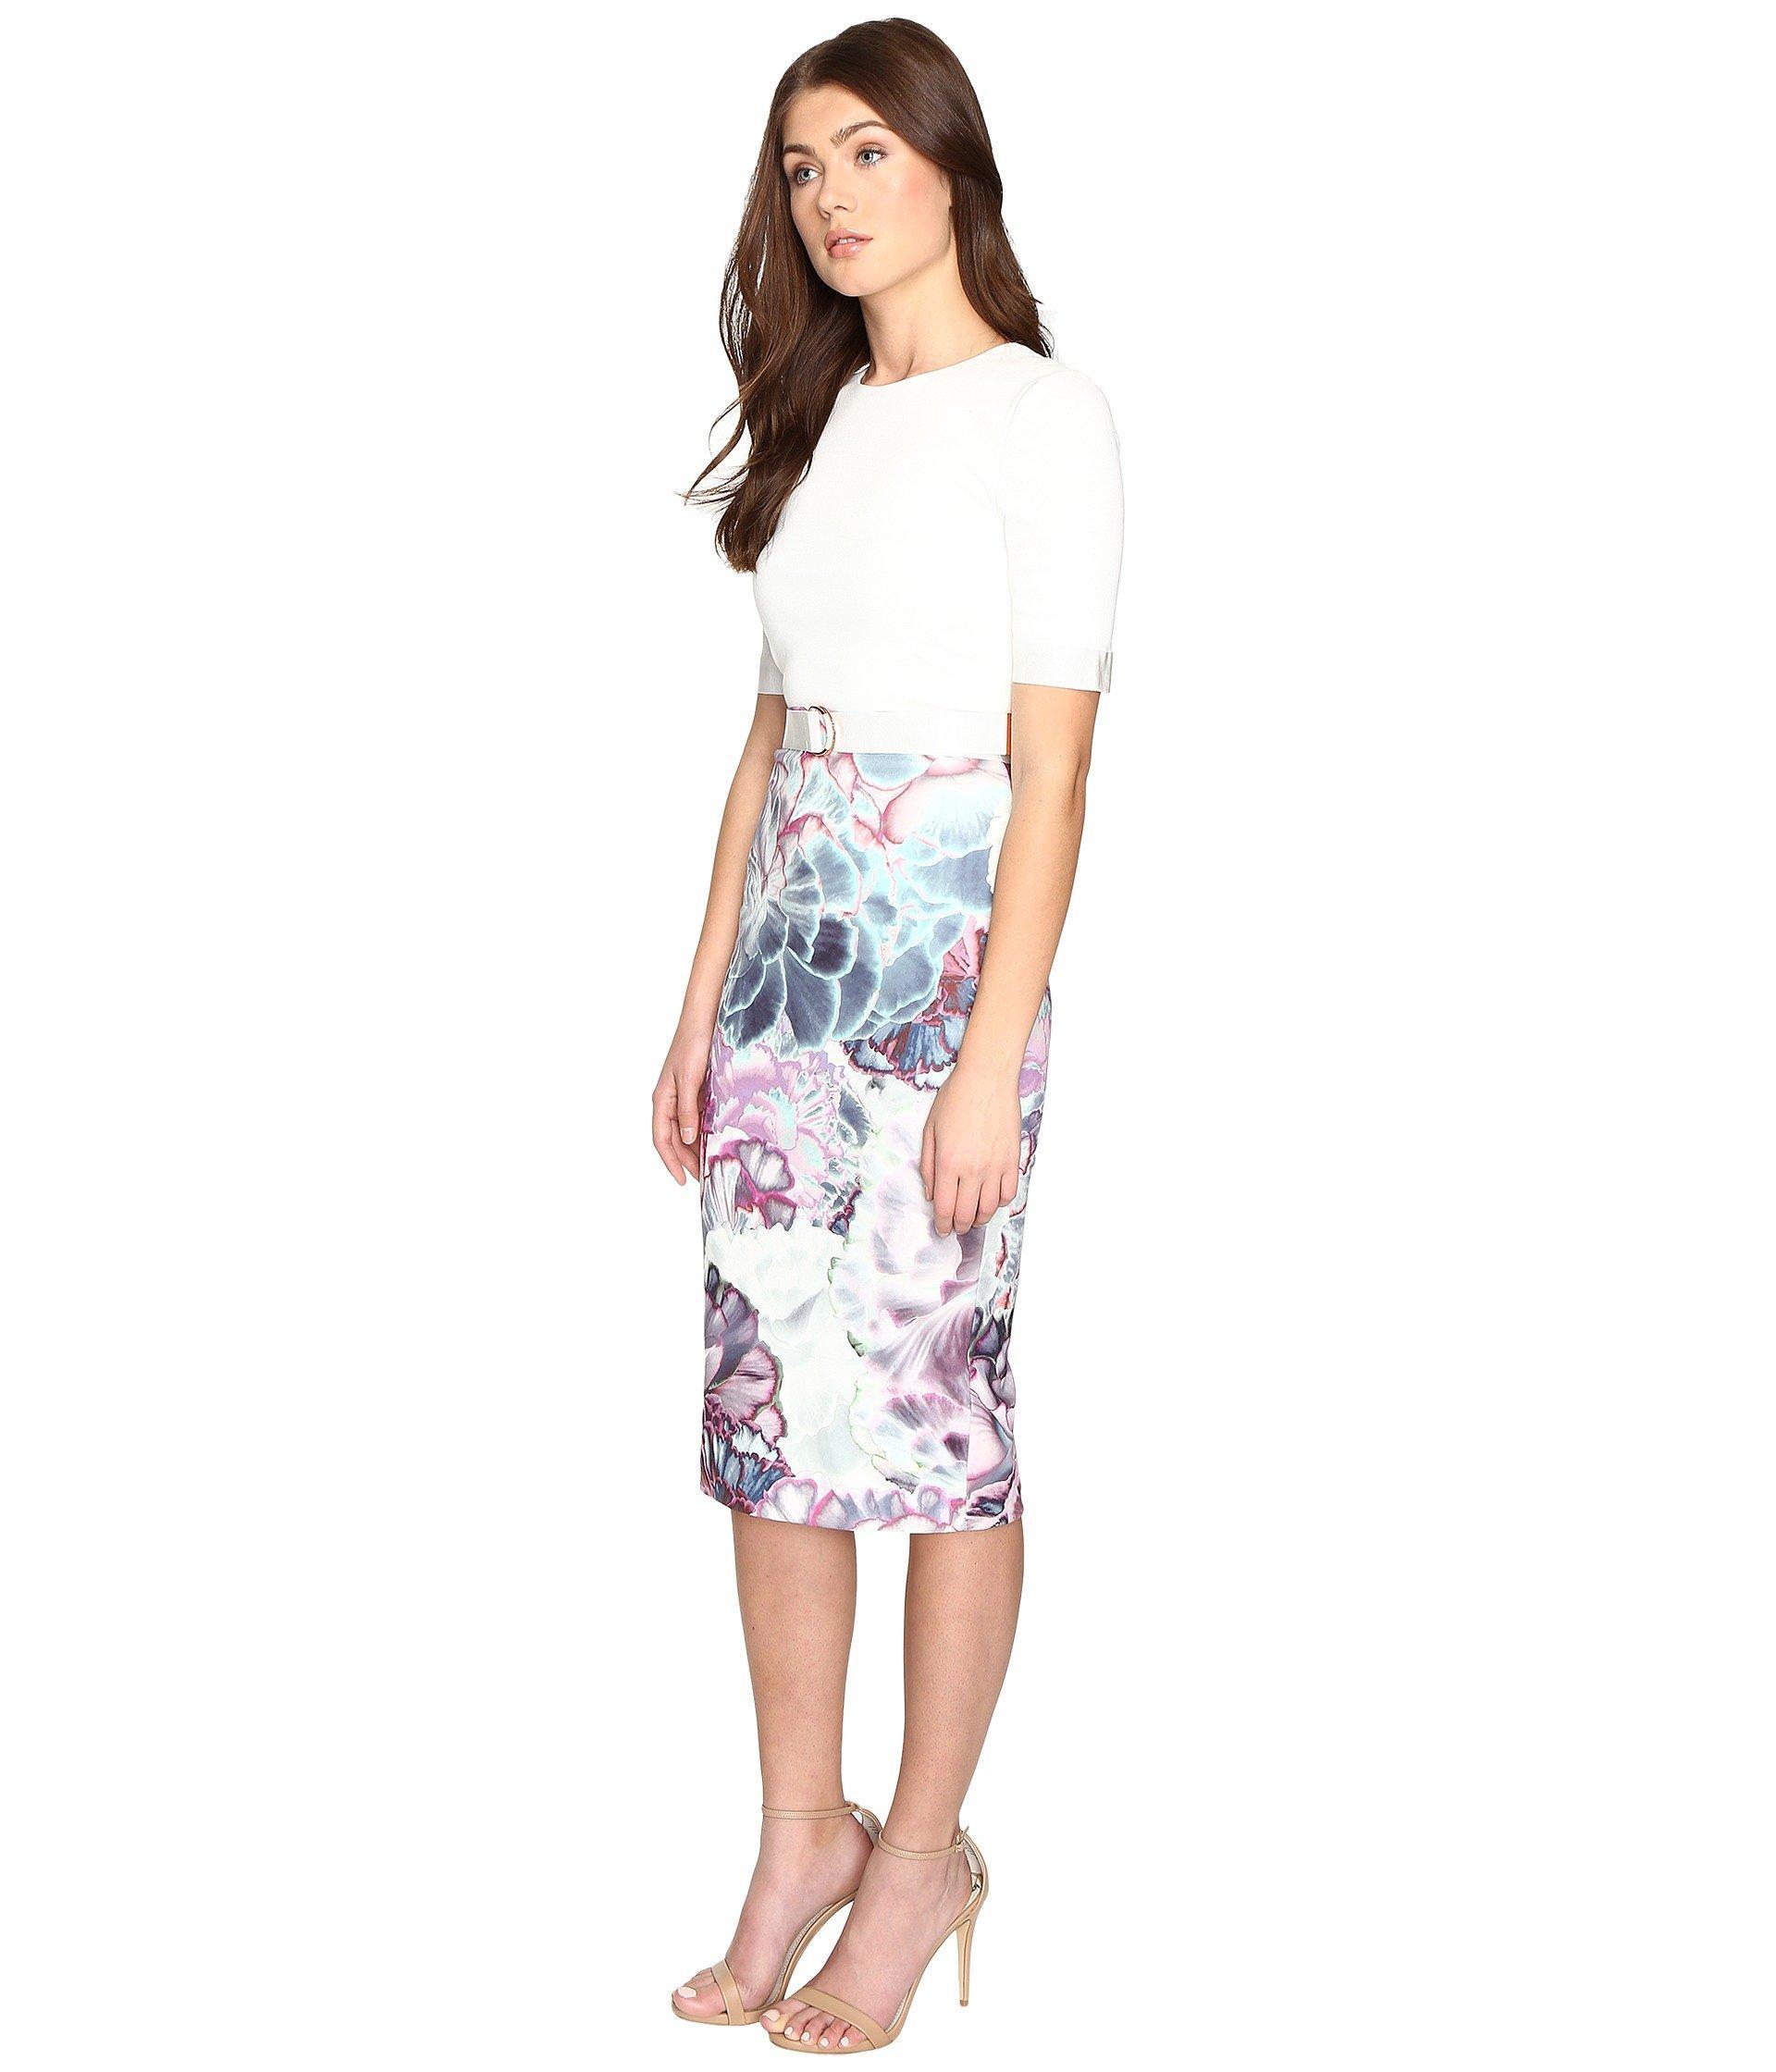 8eb7f25b Ted Baker Stephie Illuminated Bloom Contrast Dress - Lyst